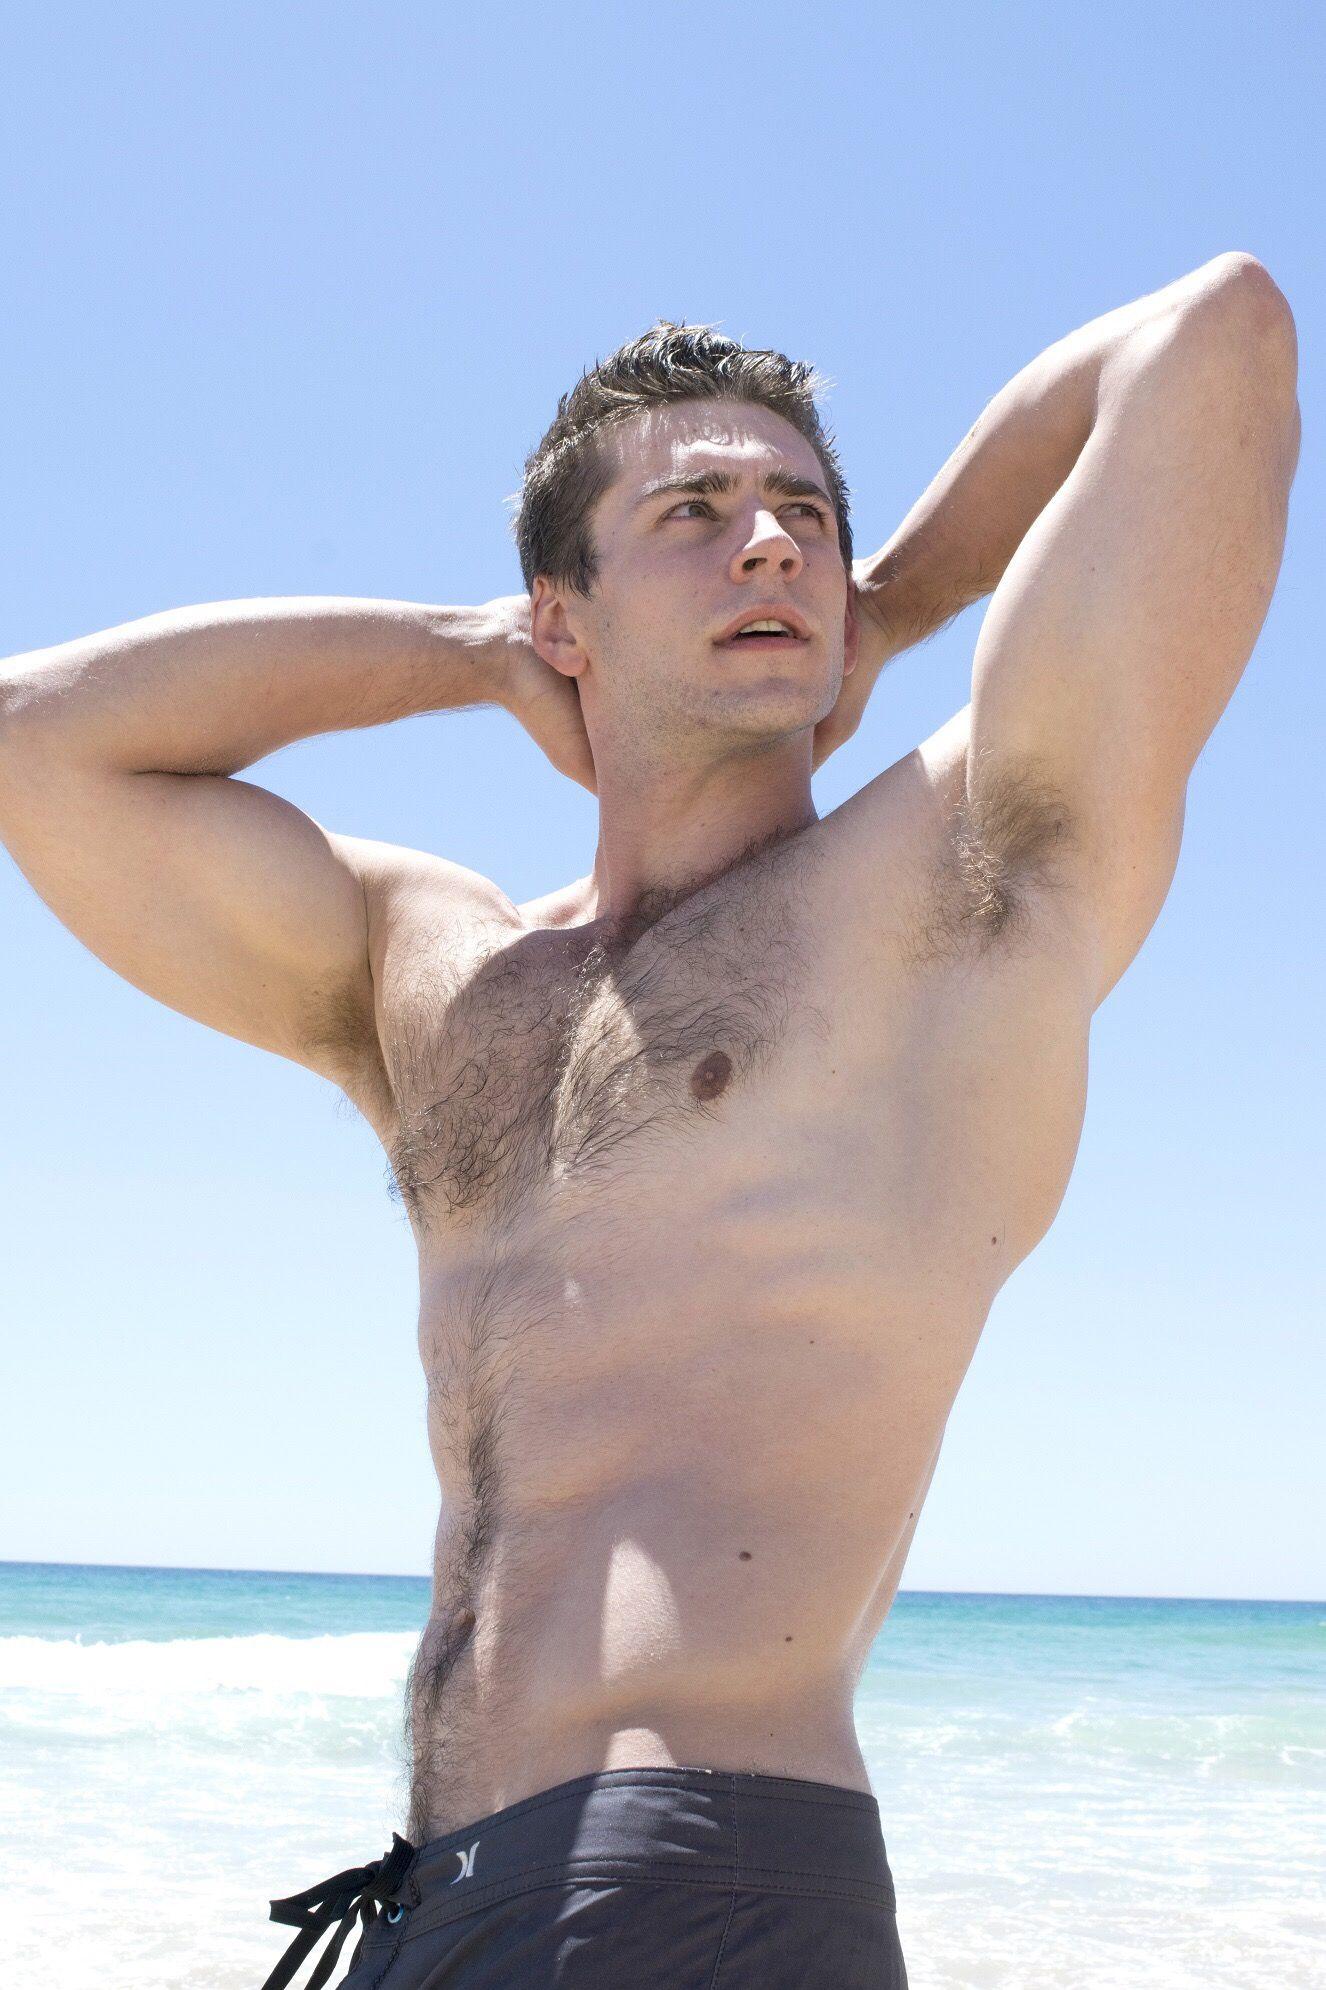 All Australian Boys levi for all australian boys   chicos guapos, que guapo y chicas